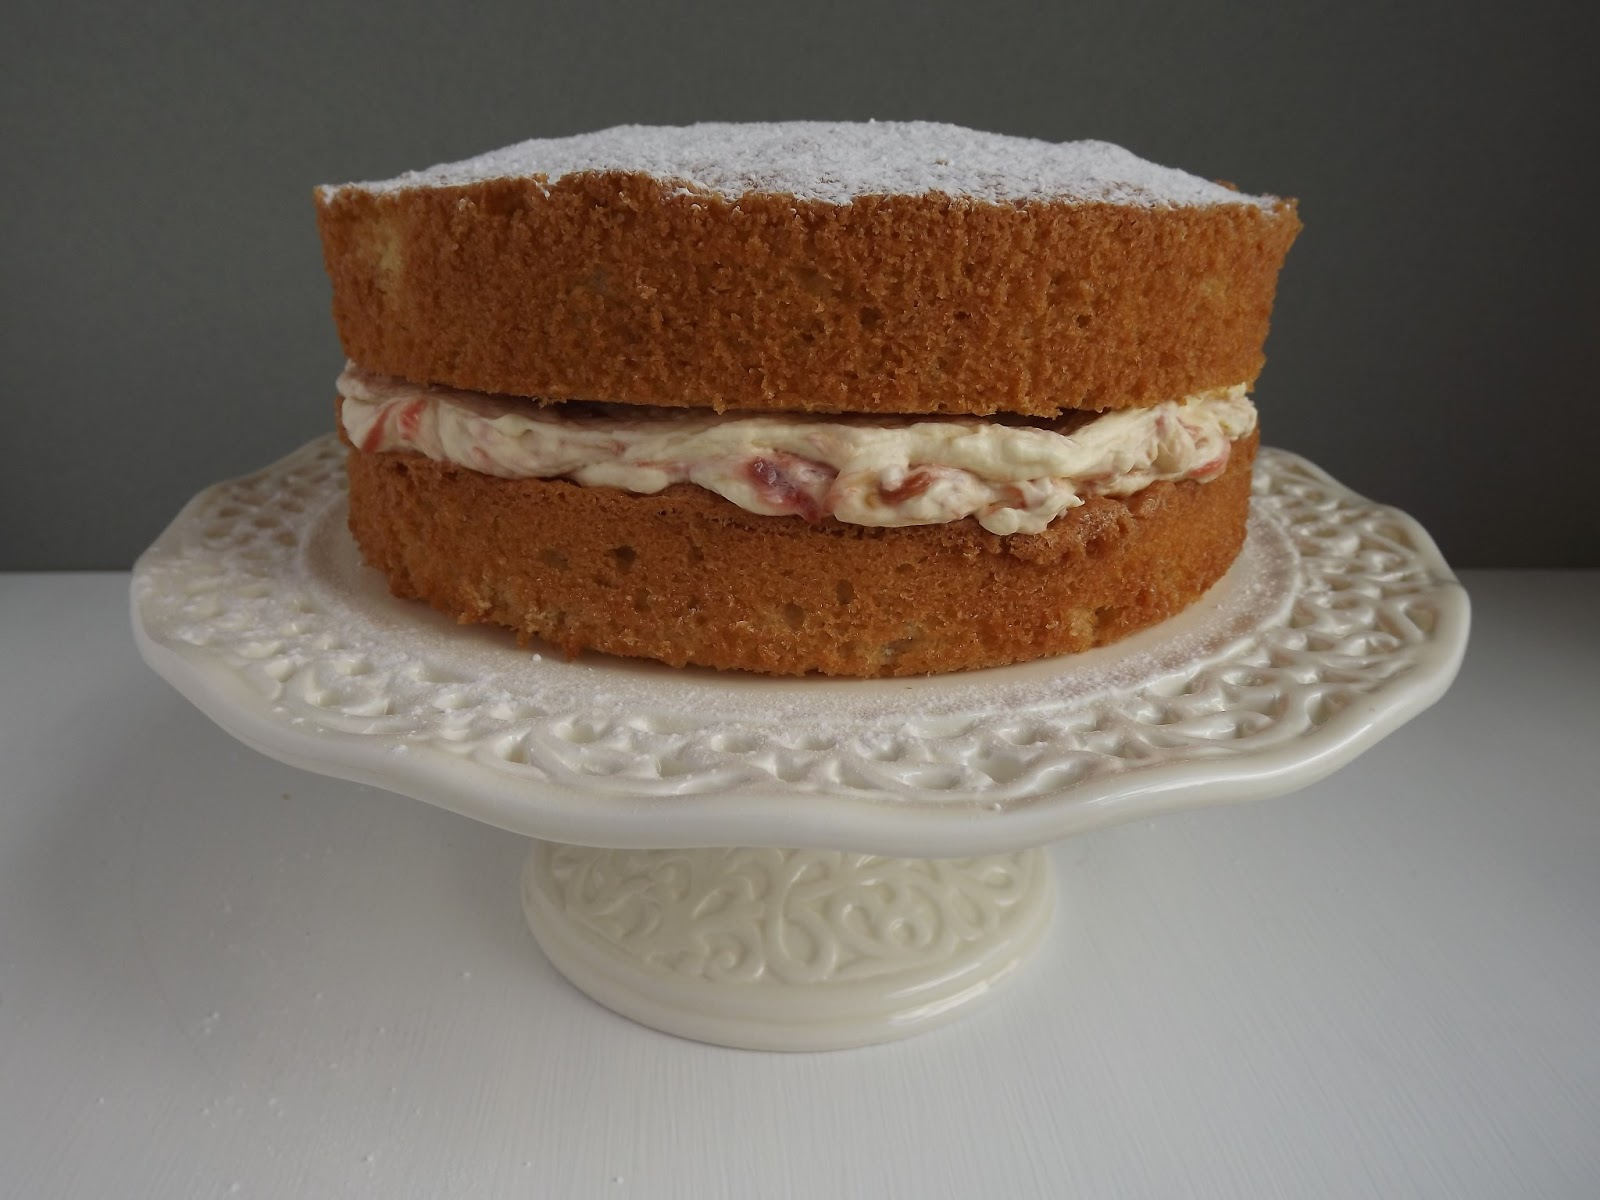 Stewed Rhubarb Sponge Cake